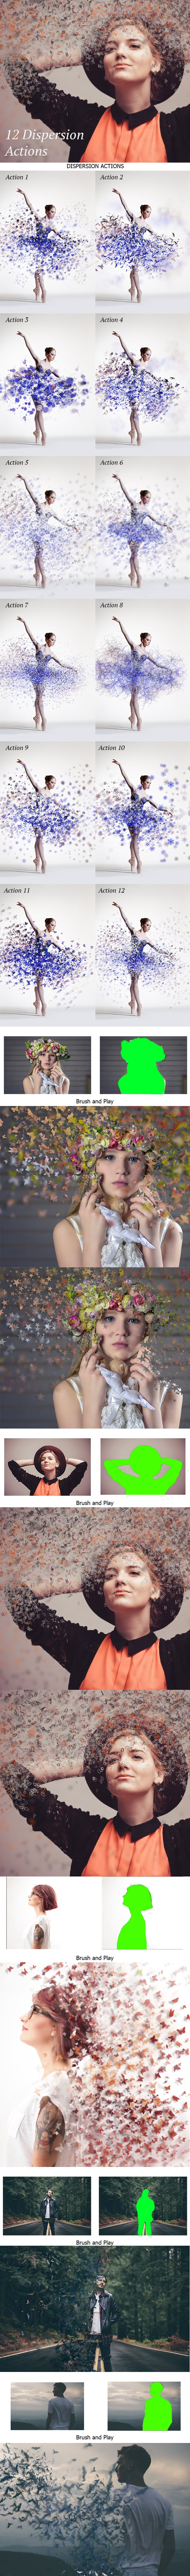 63 VSCO Photoshop Actions: Artistic Actions Bundle - just $9 - 14